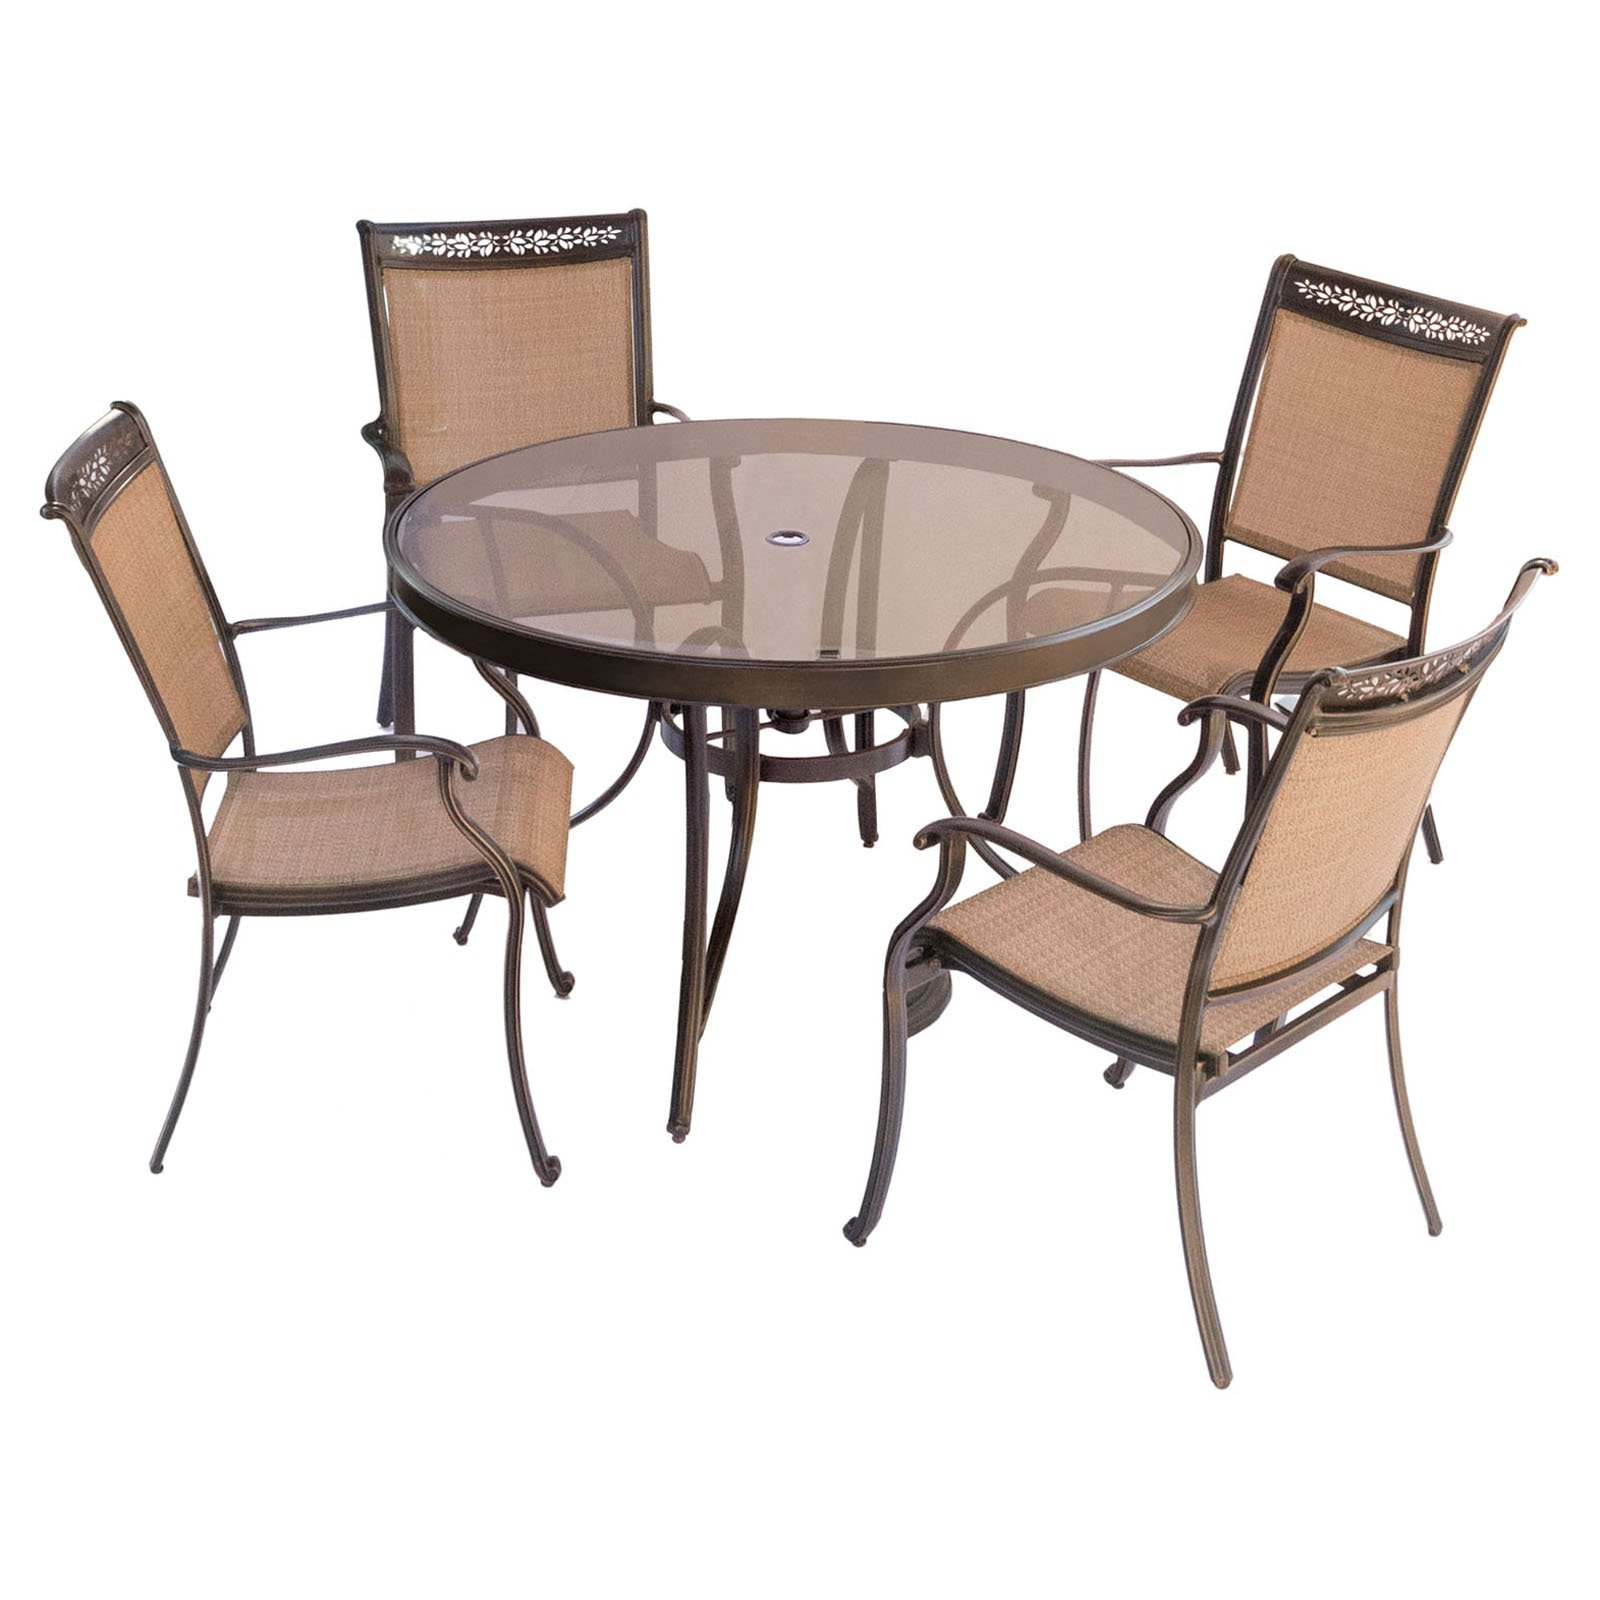 Hanover Fontana 5-Piece Outdoor Dining Set